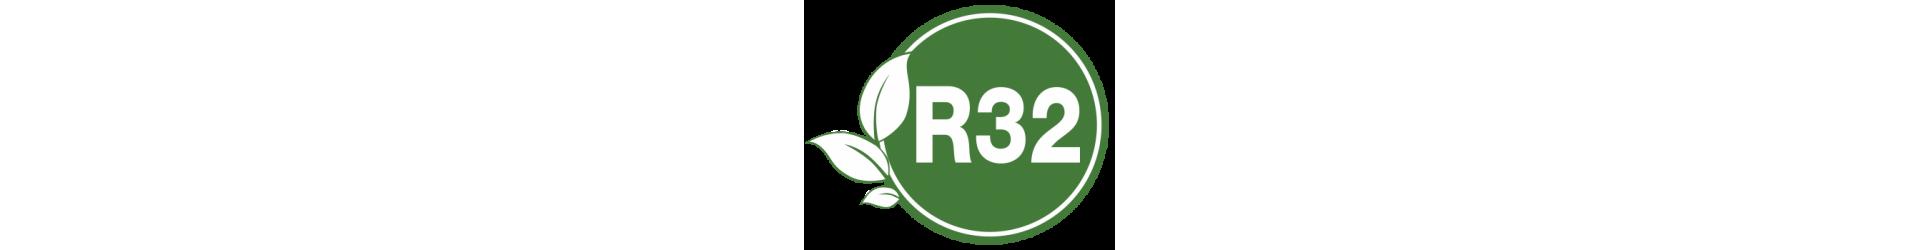 R32 Mitsubishi